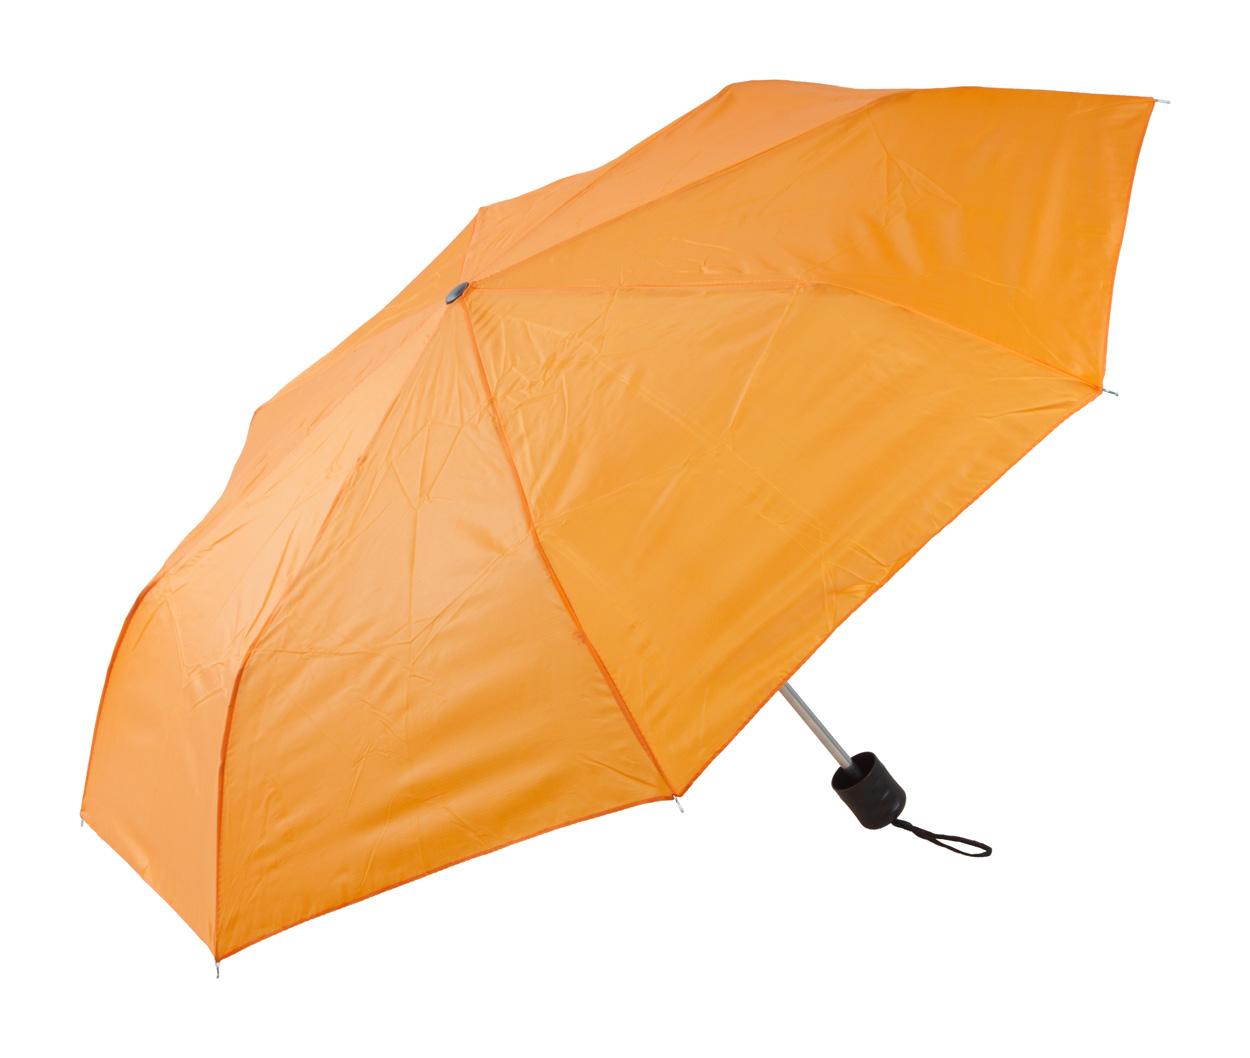 Mint ombrello